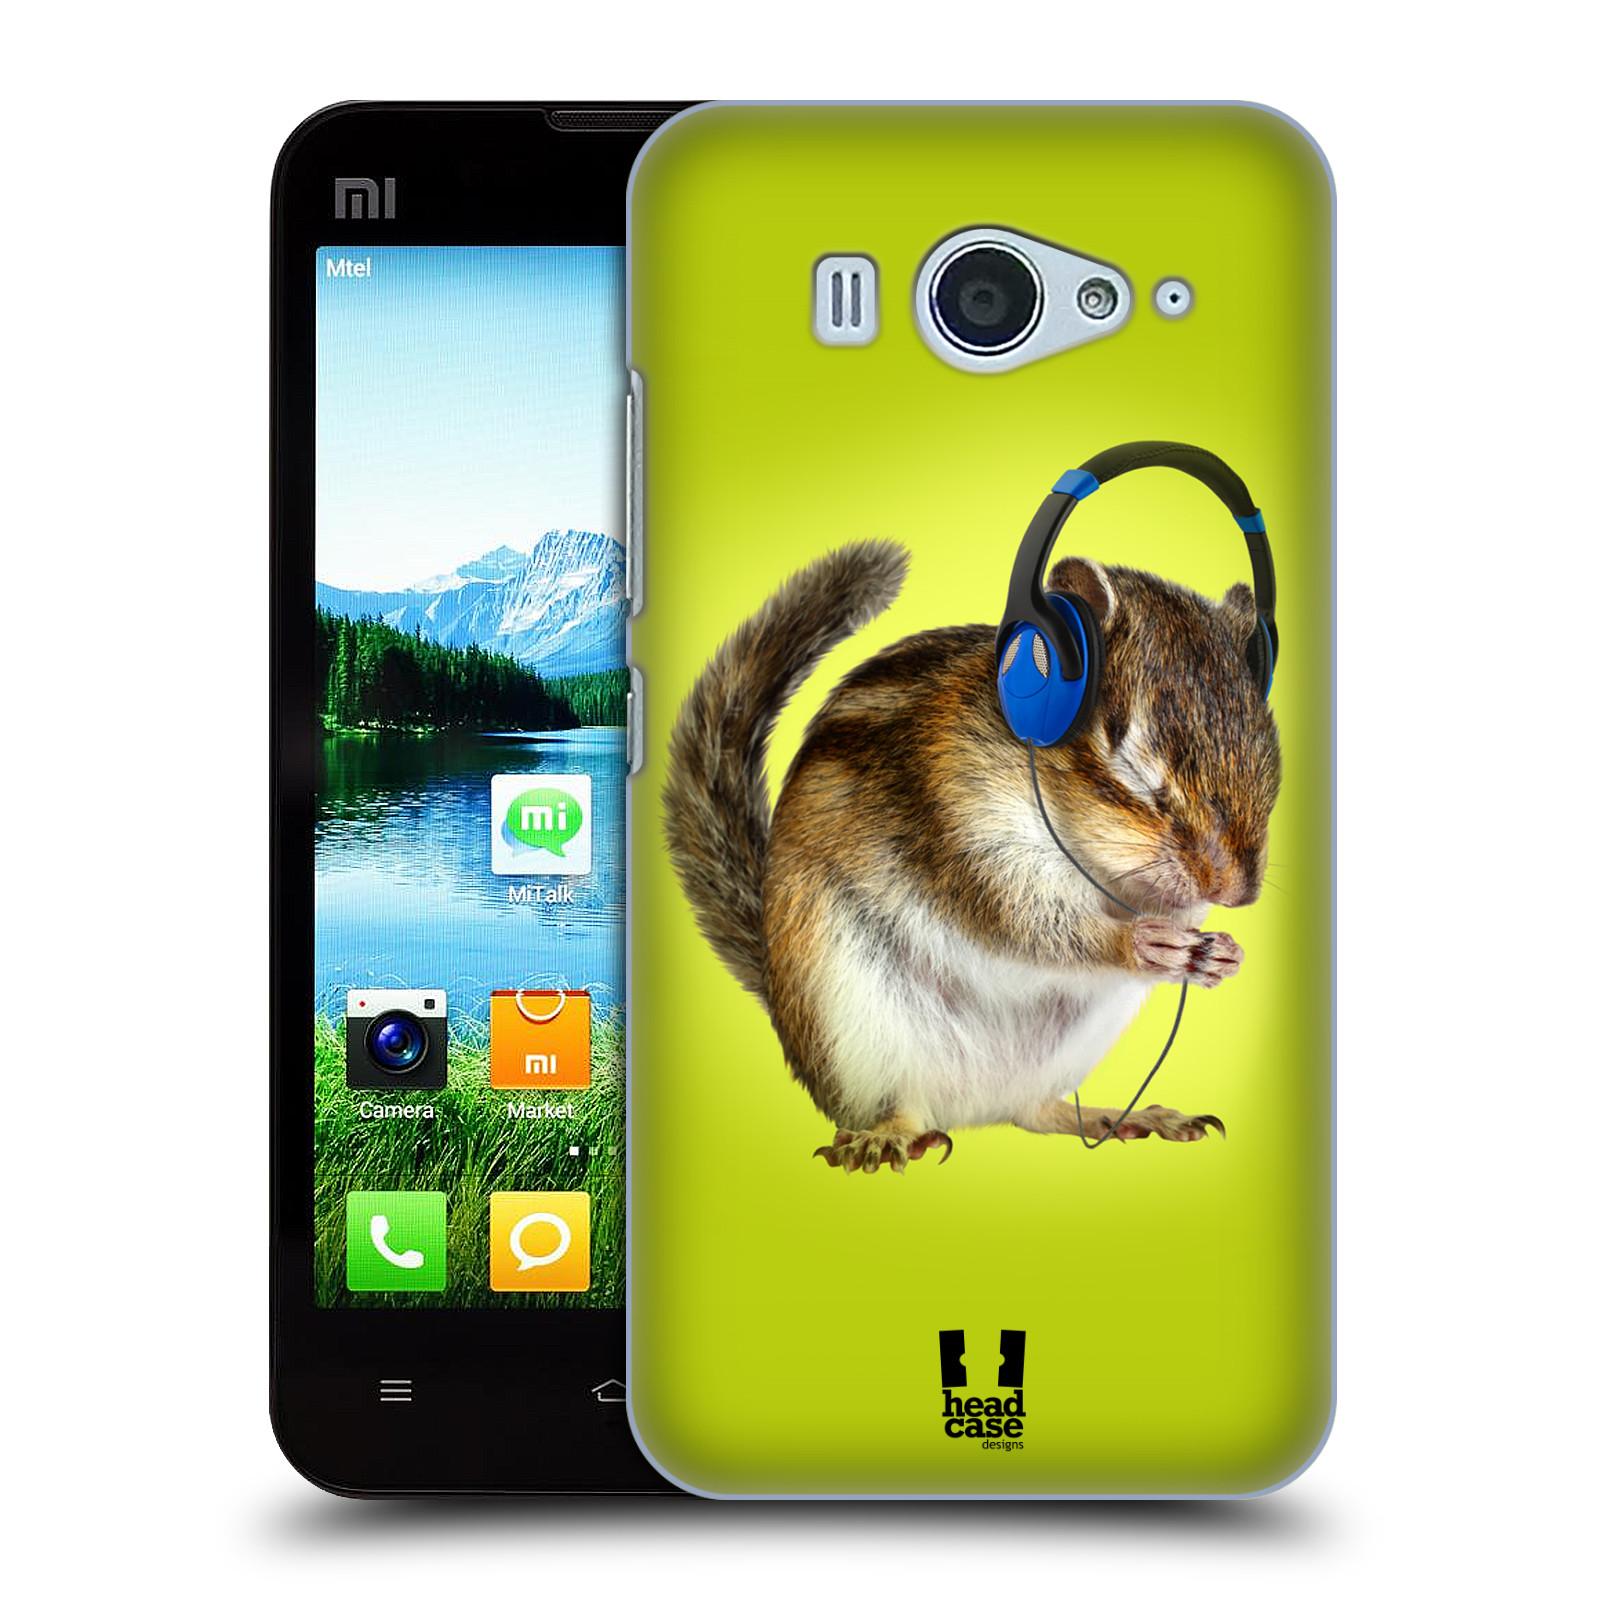 HEAD CASE pevný plastový obal na mobil XIAOMI MI2s vzor Legrační zvířátka veverka se sluchátky